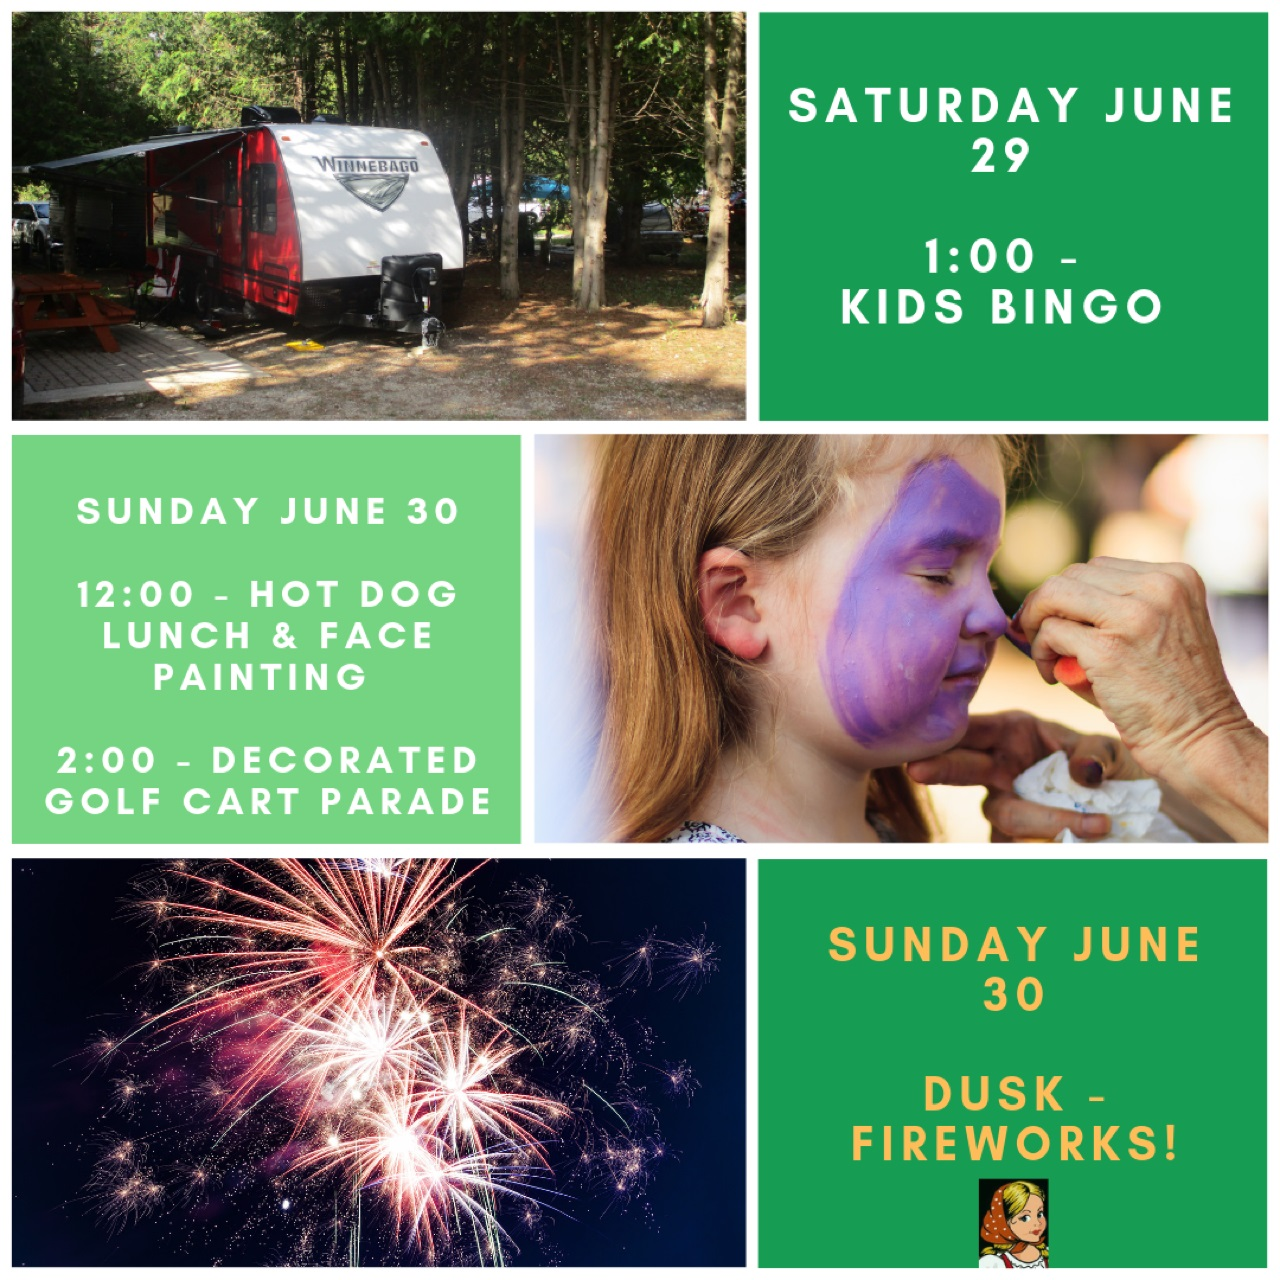 Activities This Weekend - June 29 & 30/19 - Thumbnail